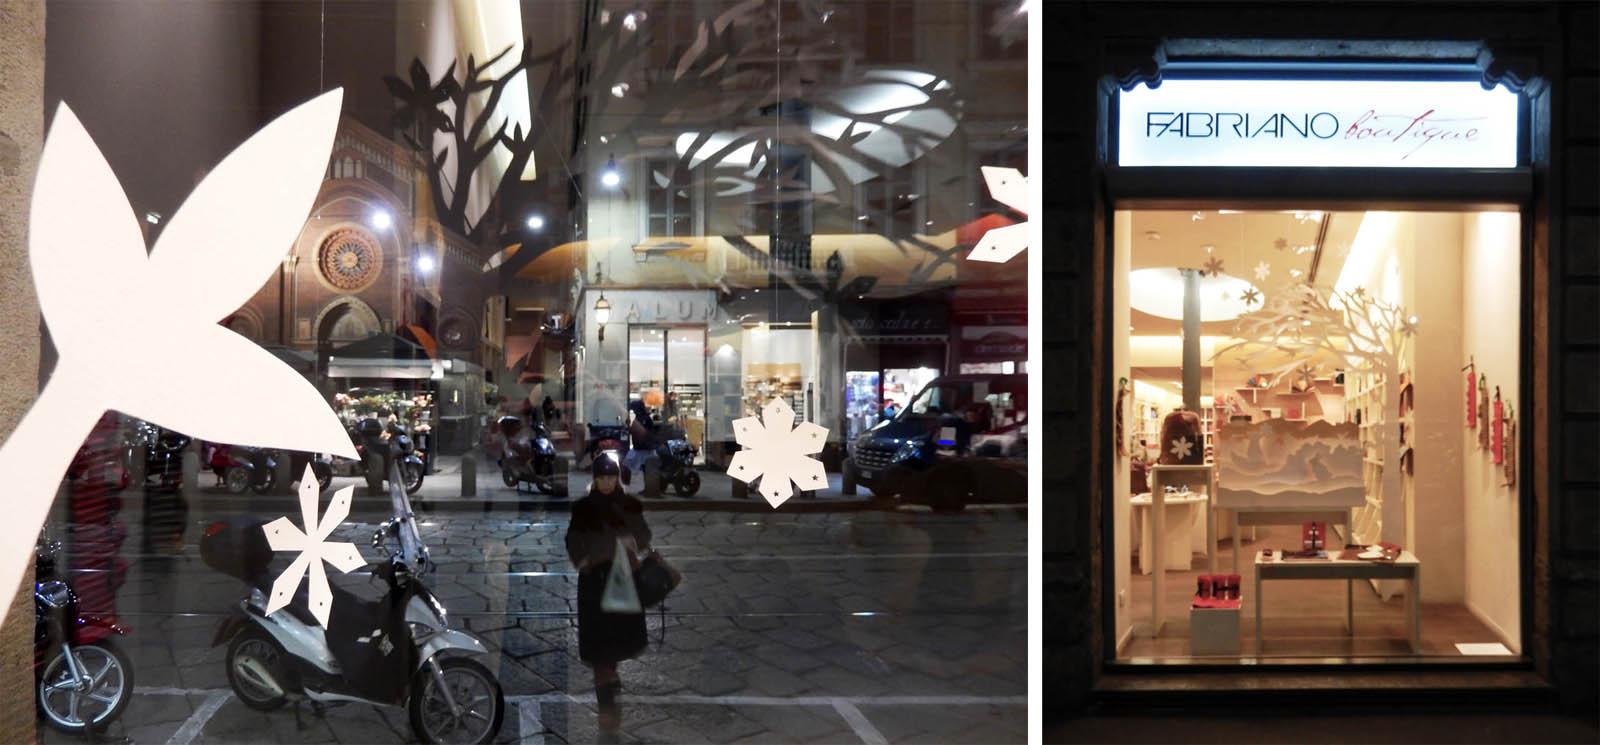 inverno-papercut-fabriano-vetrine-wonderland-milano (4)